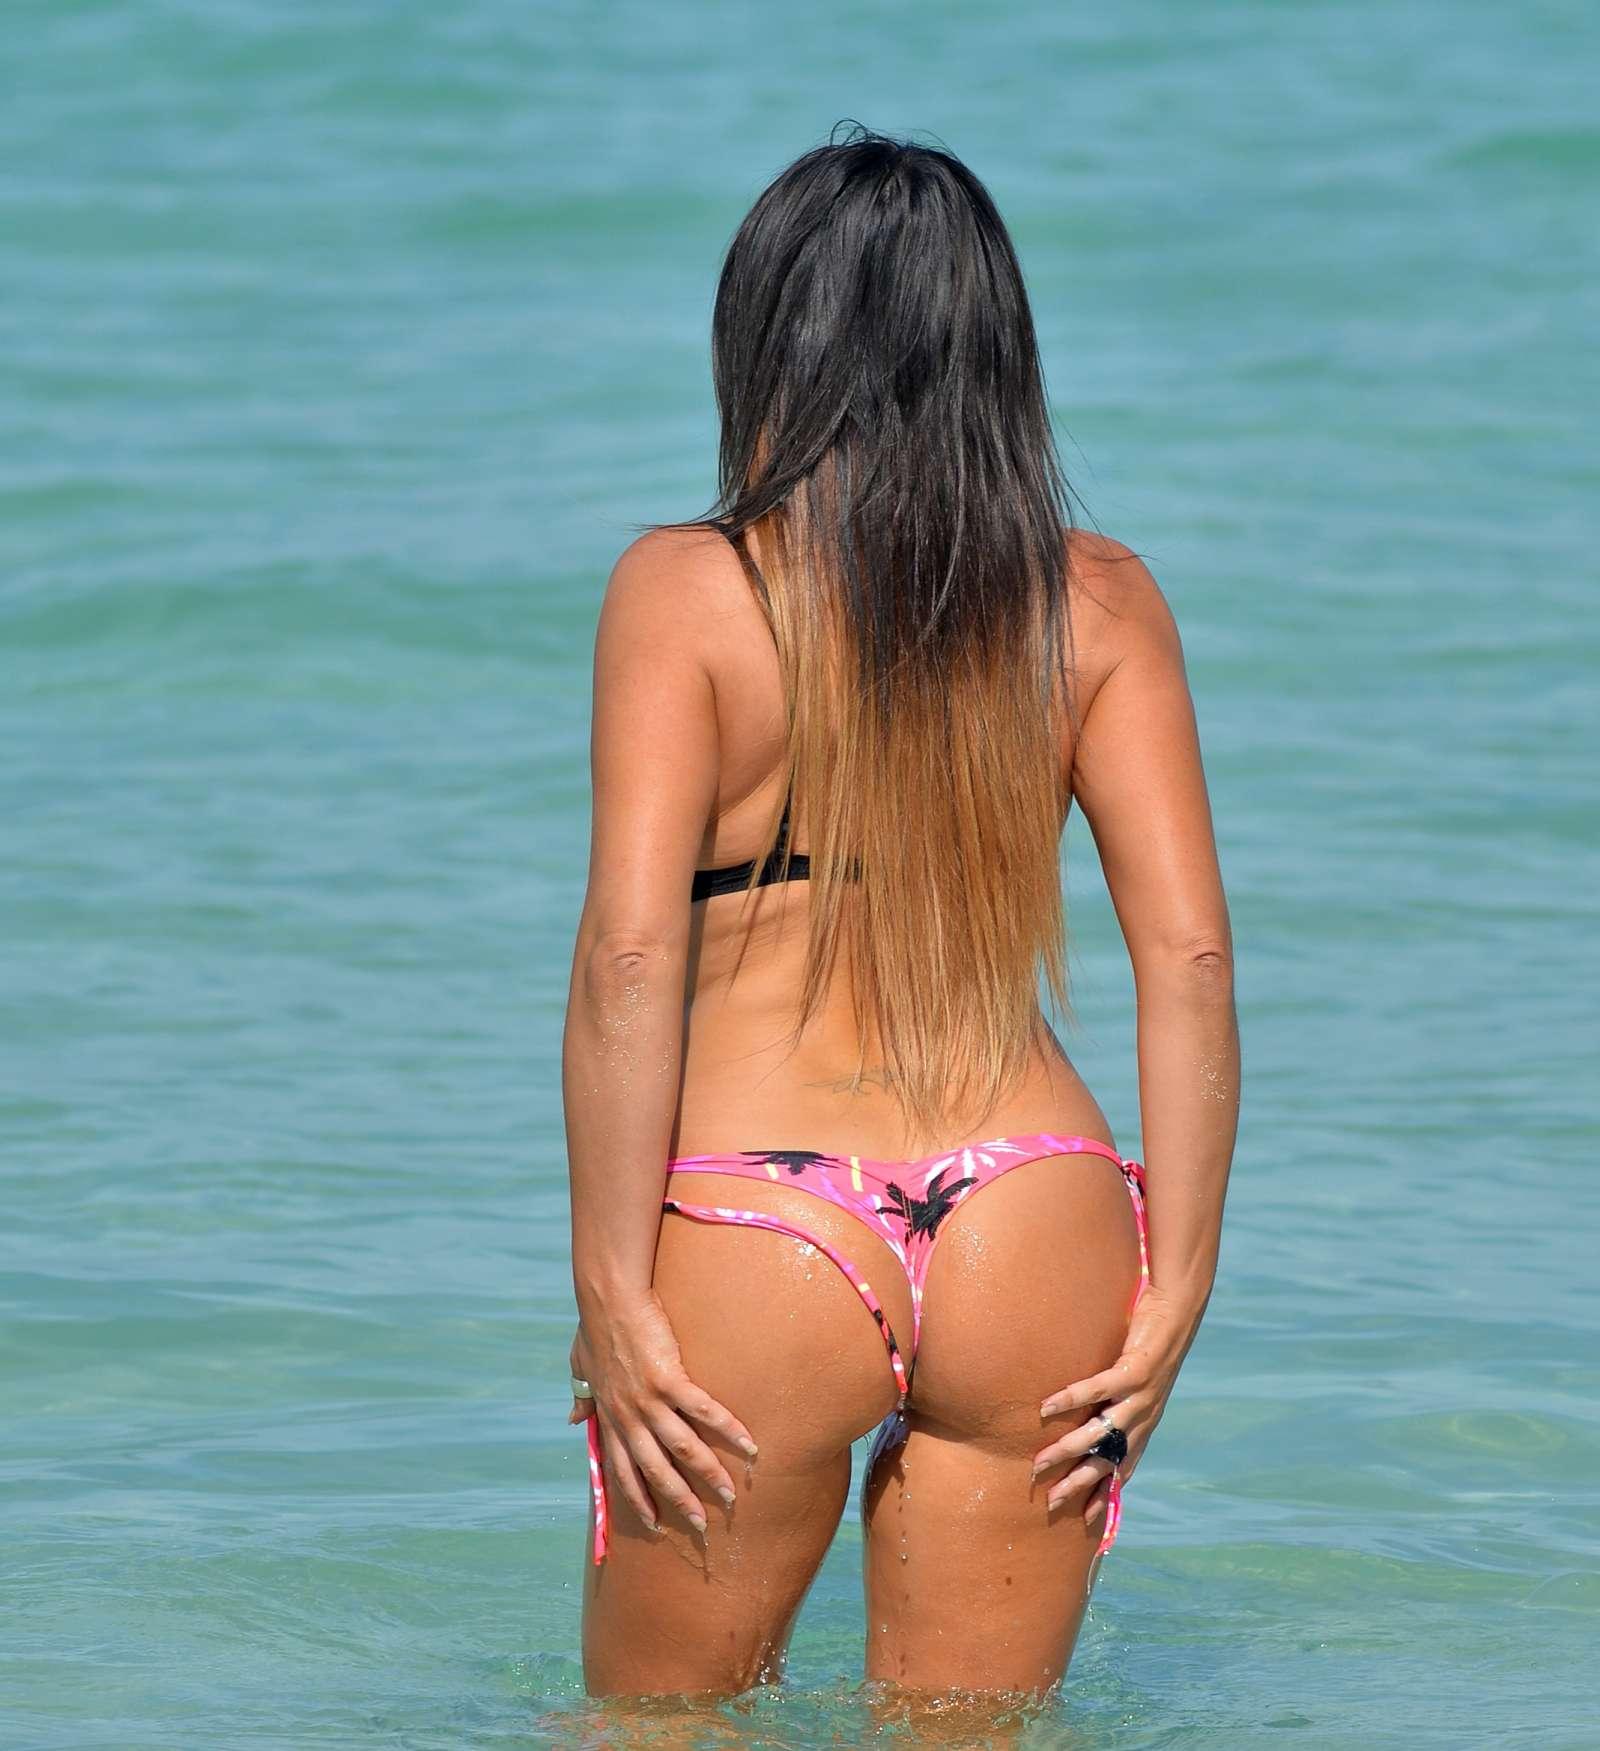 Dua Lipa Unleashes Booty And Boobs As She Slips Into Teeny String Thong Bikini